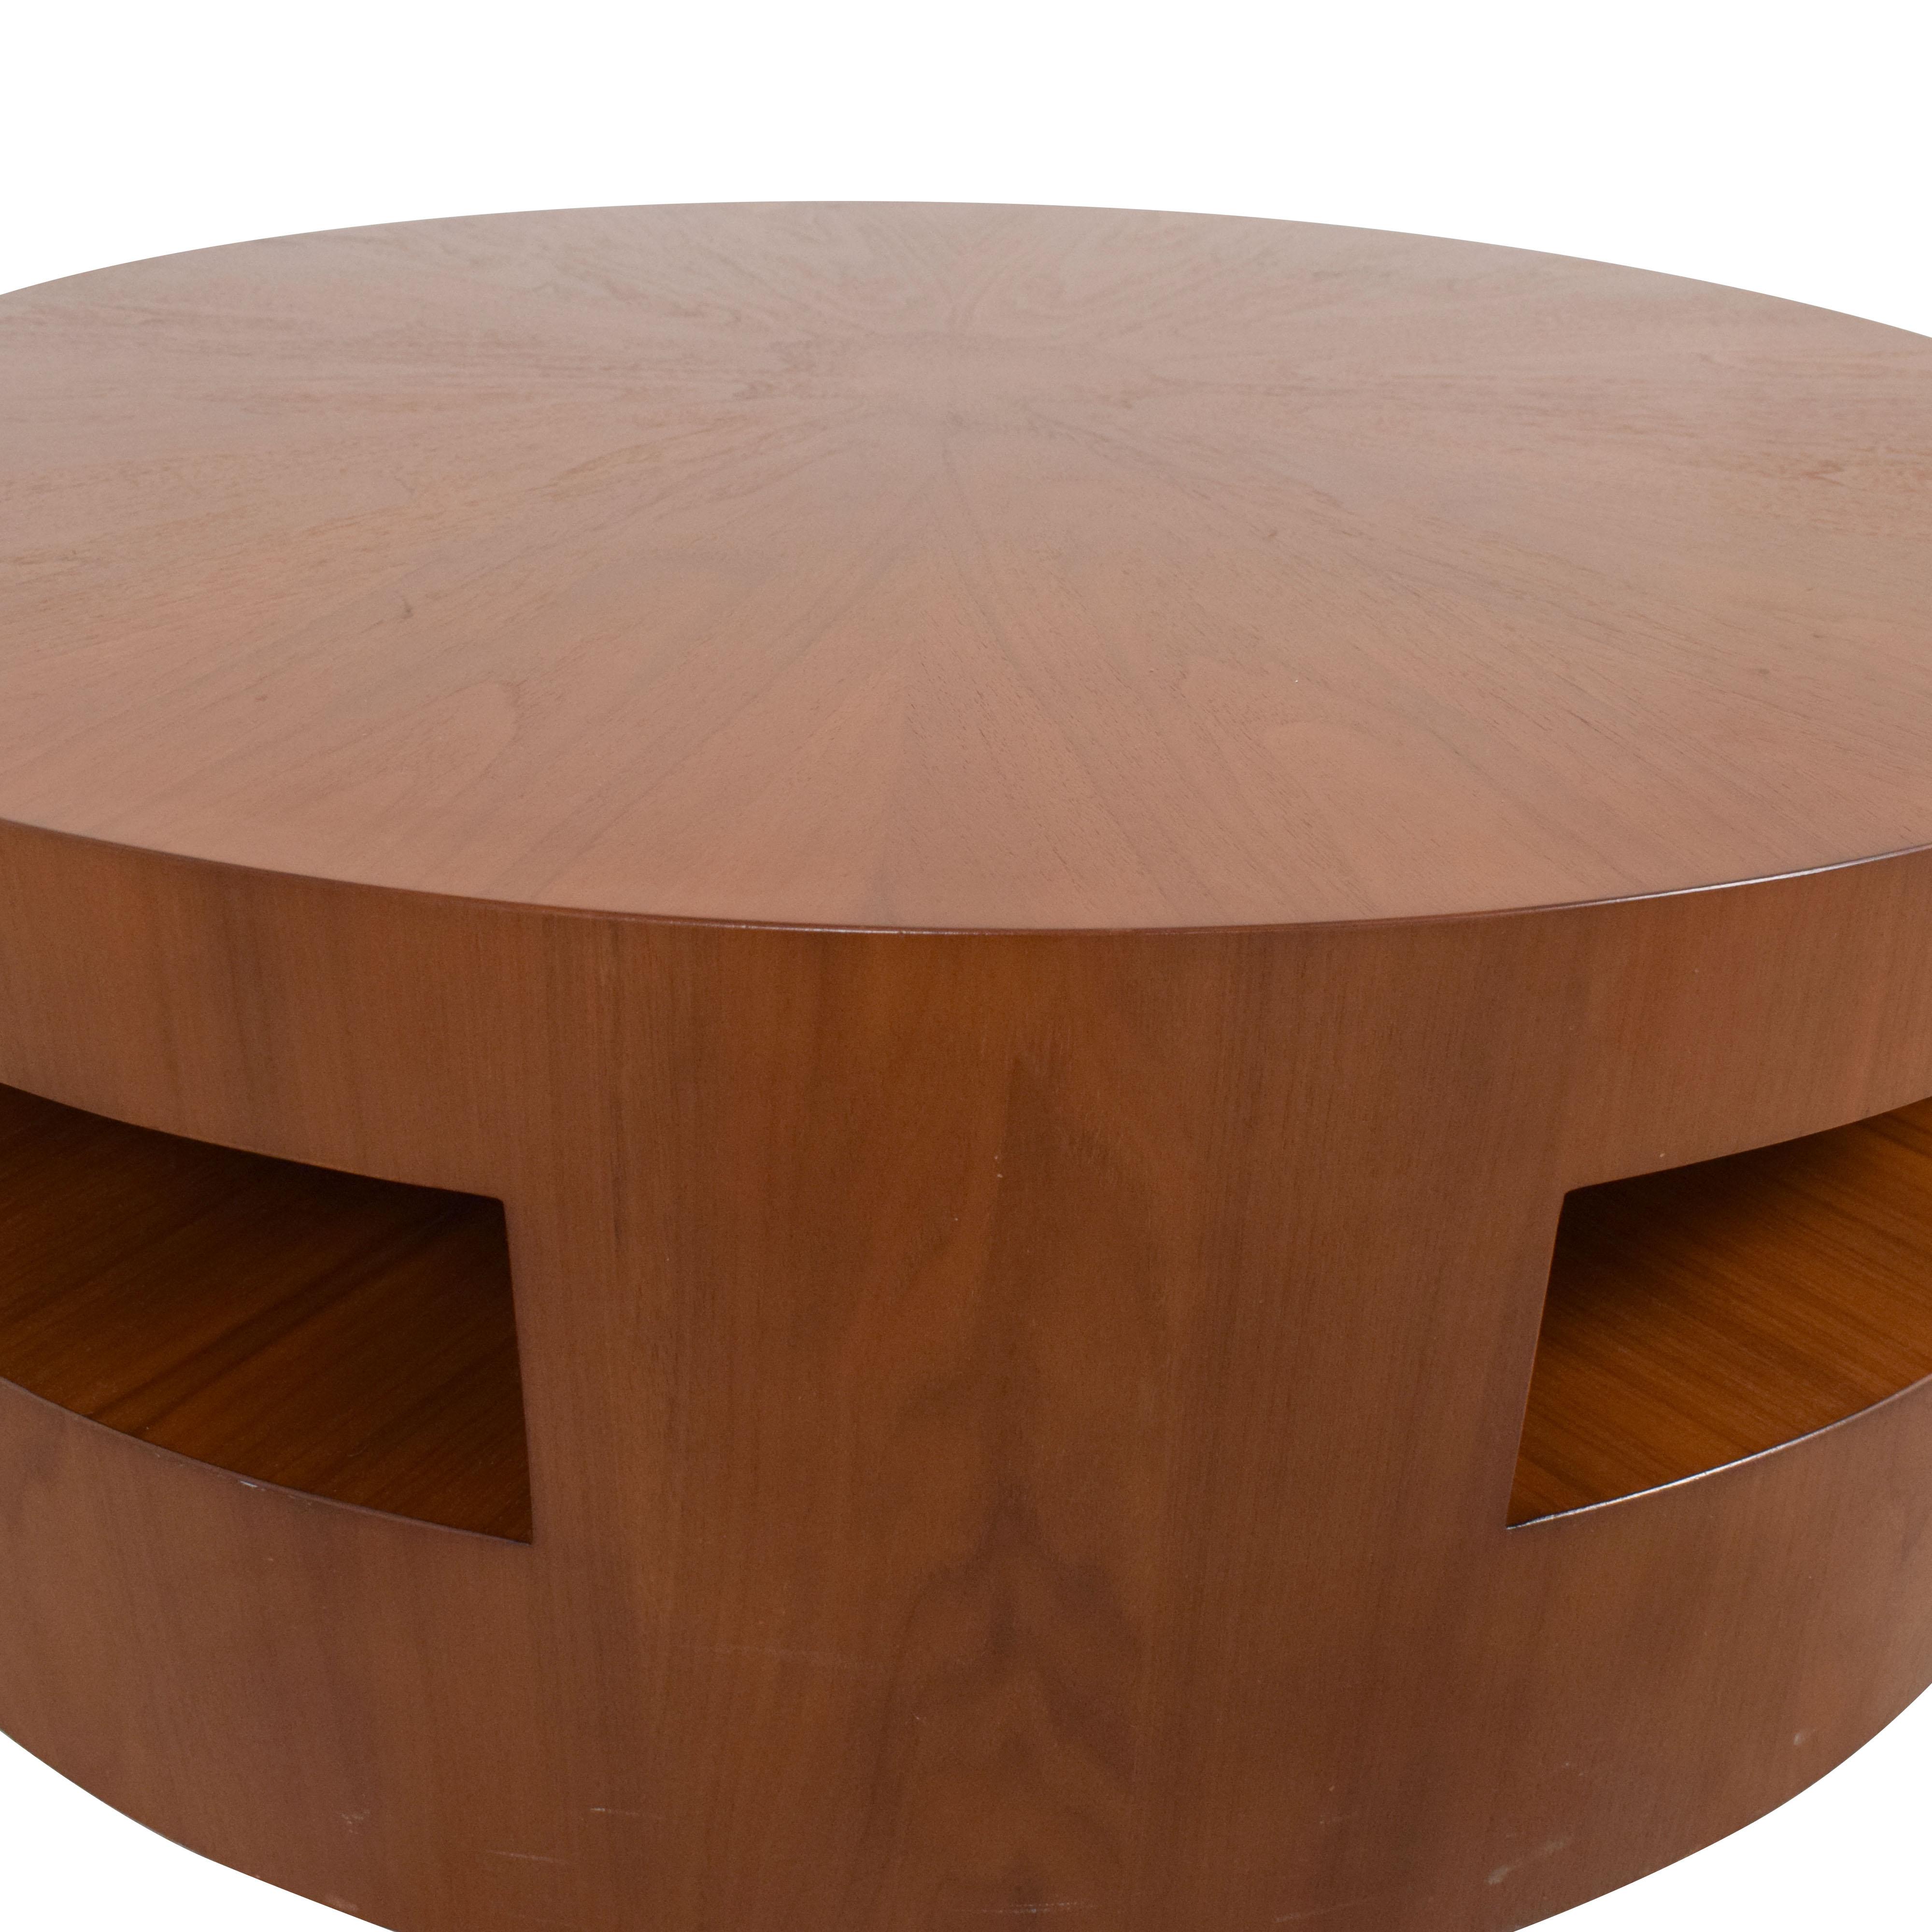 Crate & Barrel Crate & Barrel Tambe Coffee Table nj